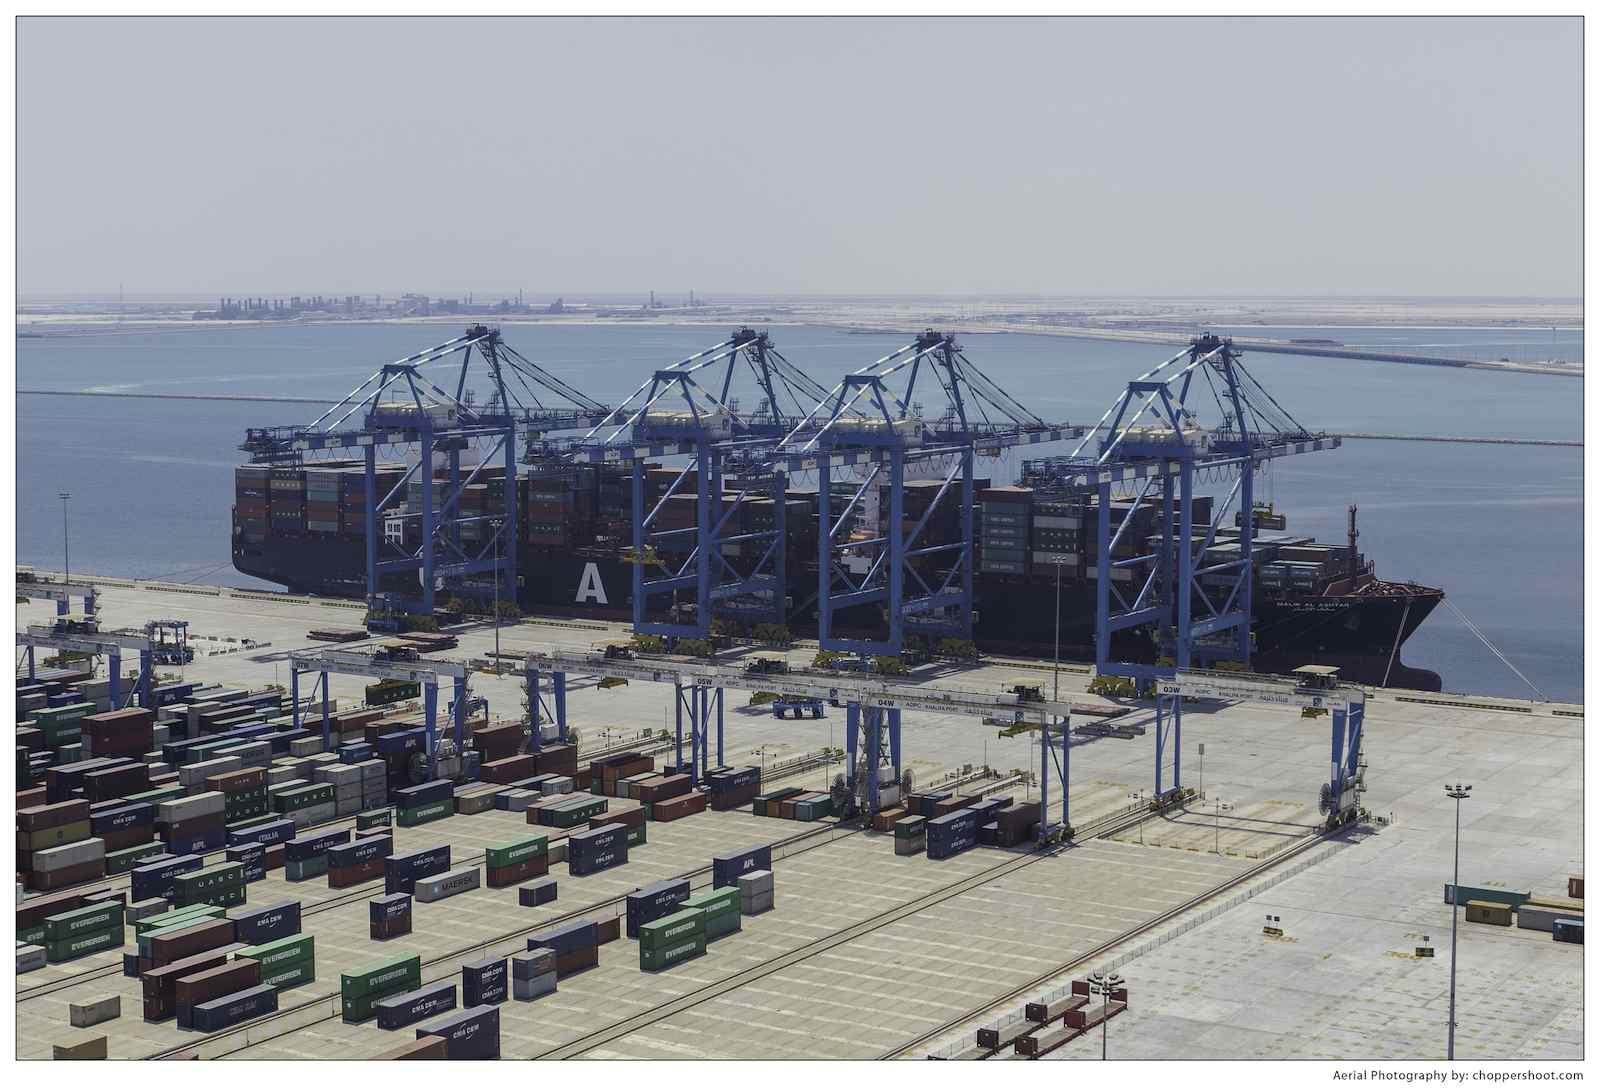 Abu Dhabi Terminals at Khalifa Port lift 3 million TEU after 3 years